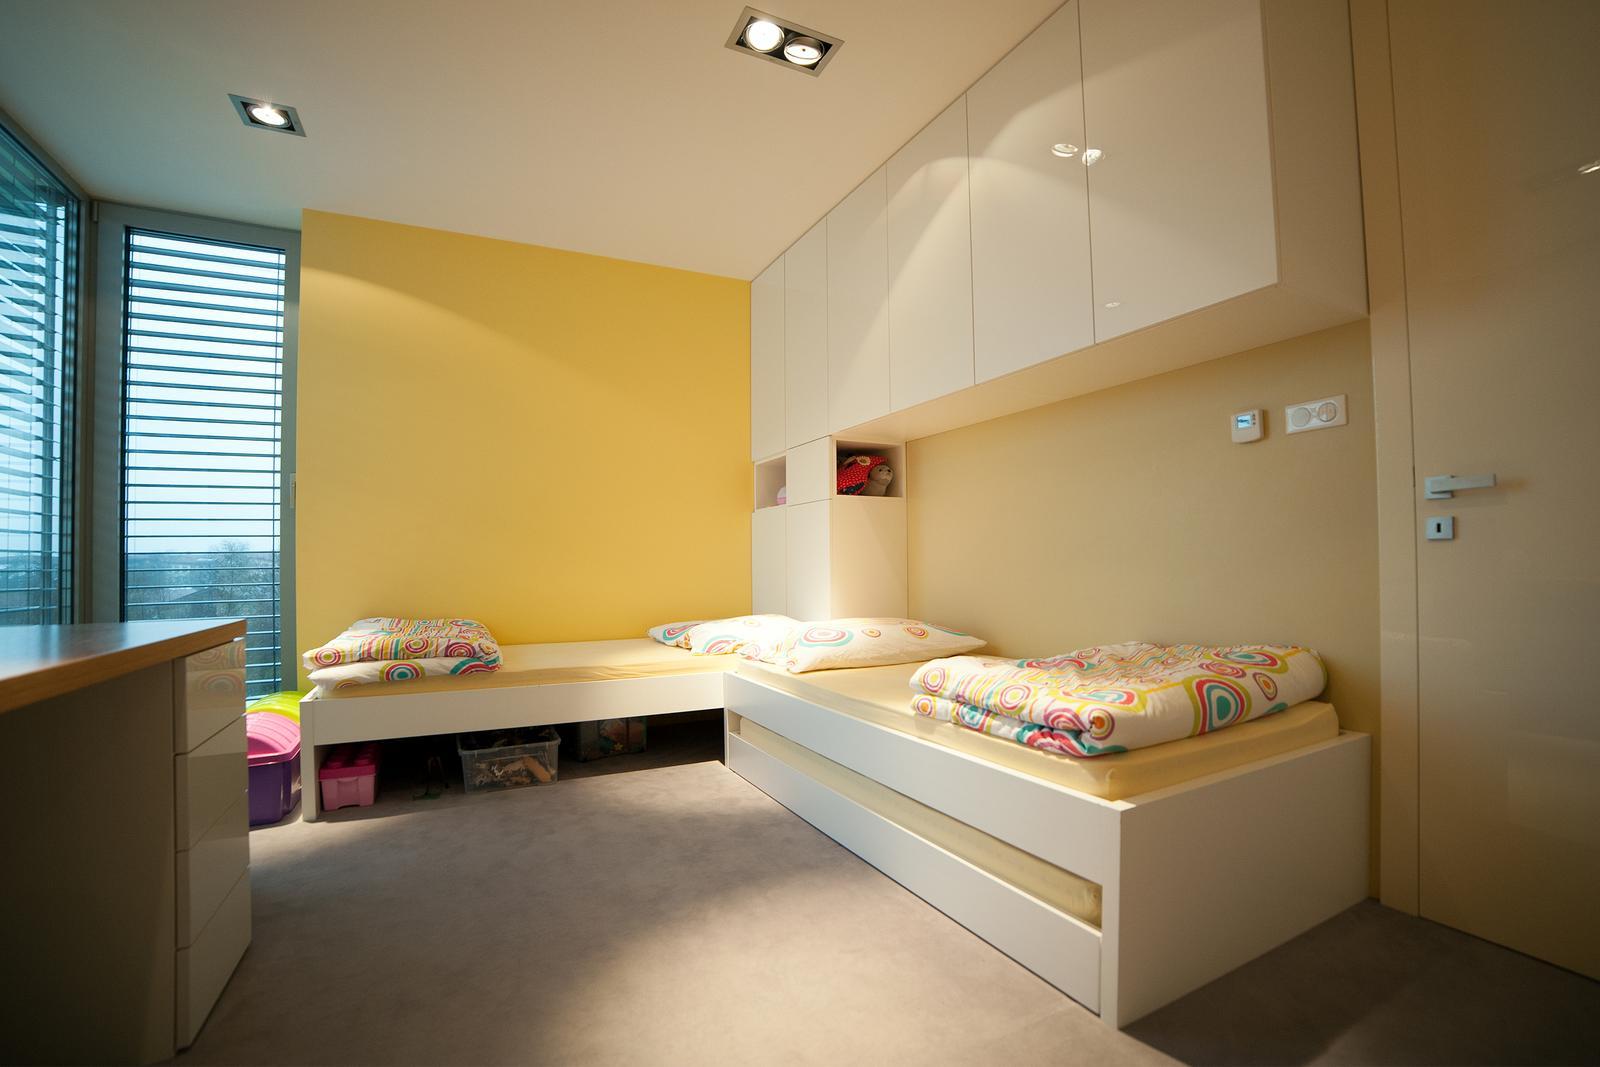 Interiér rodinného domu - detská izba a spálňa - Obrázok č. 1